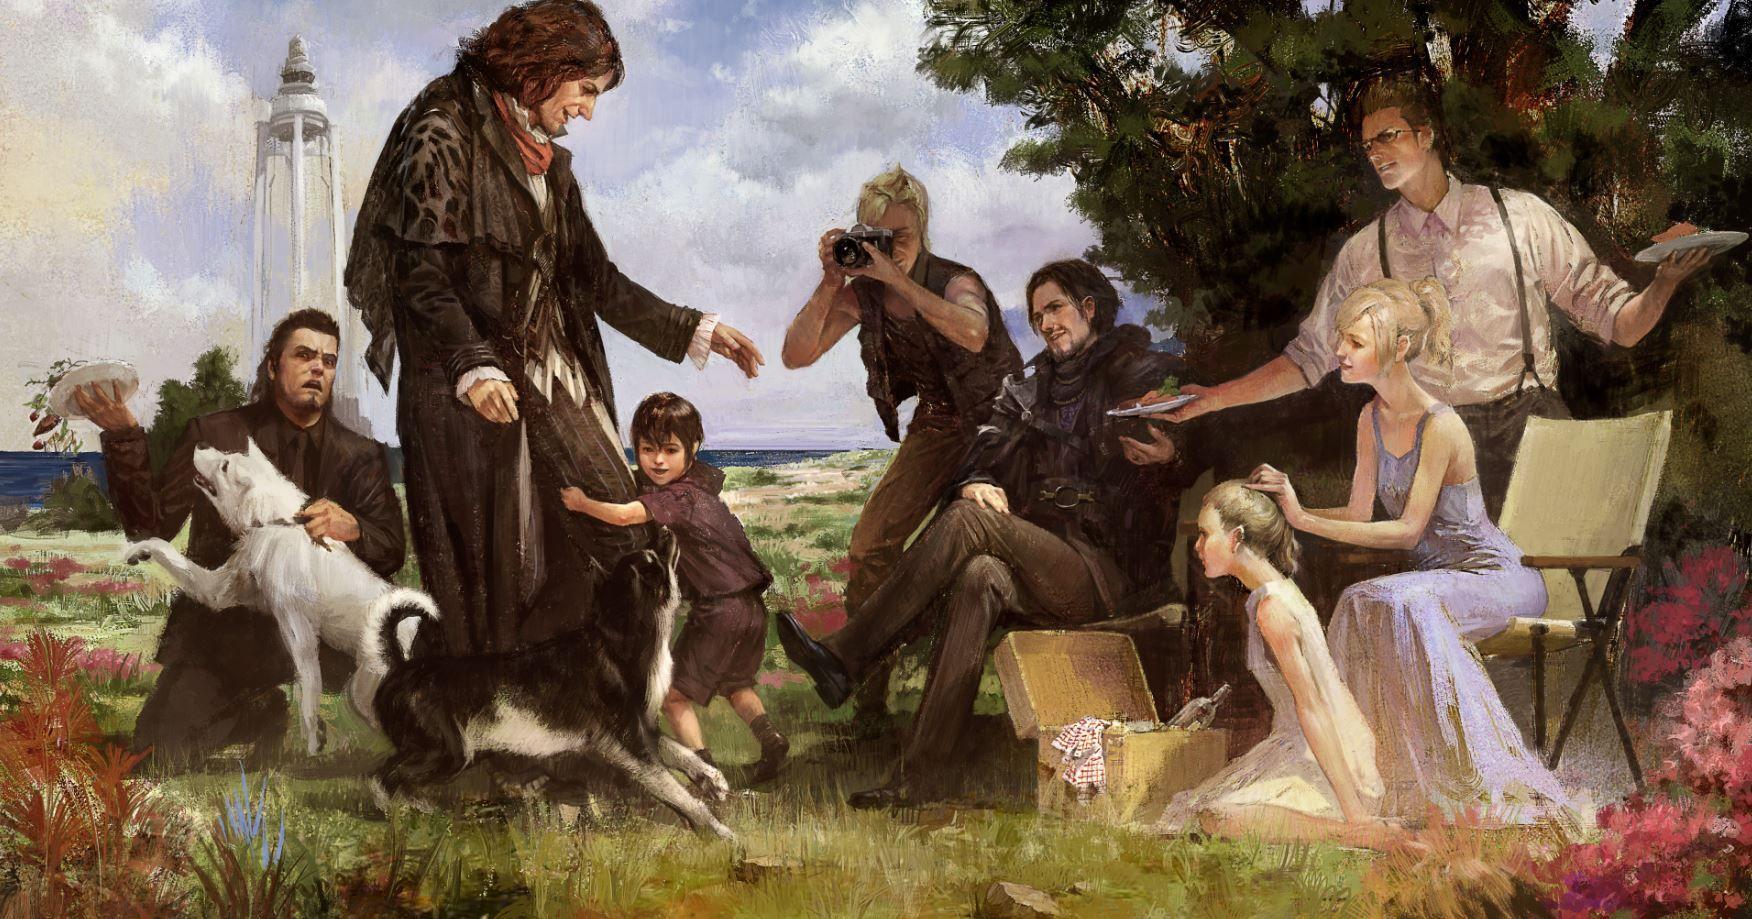 Final Fantasy XV Will Get Four More DLC Episodes Including Ardyn Luna And Aranea